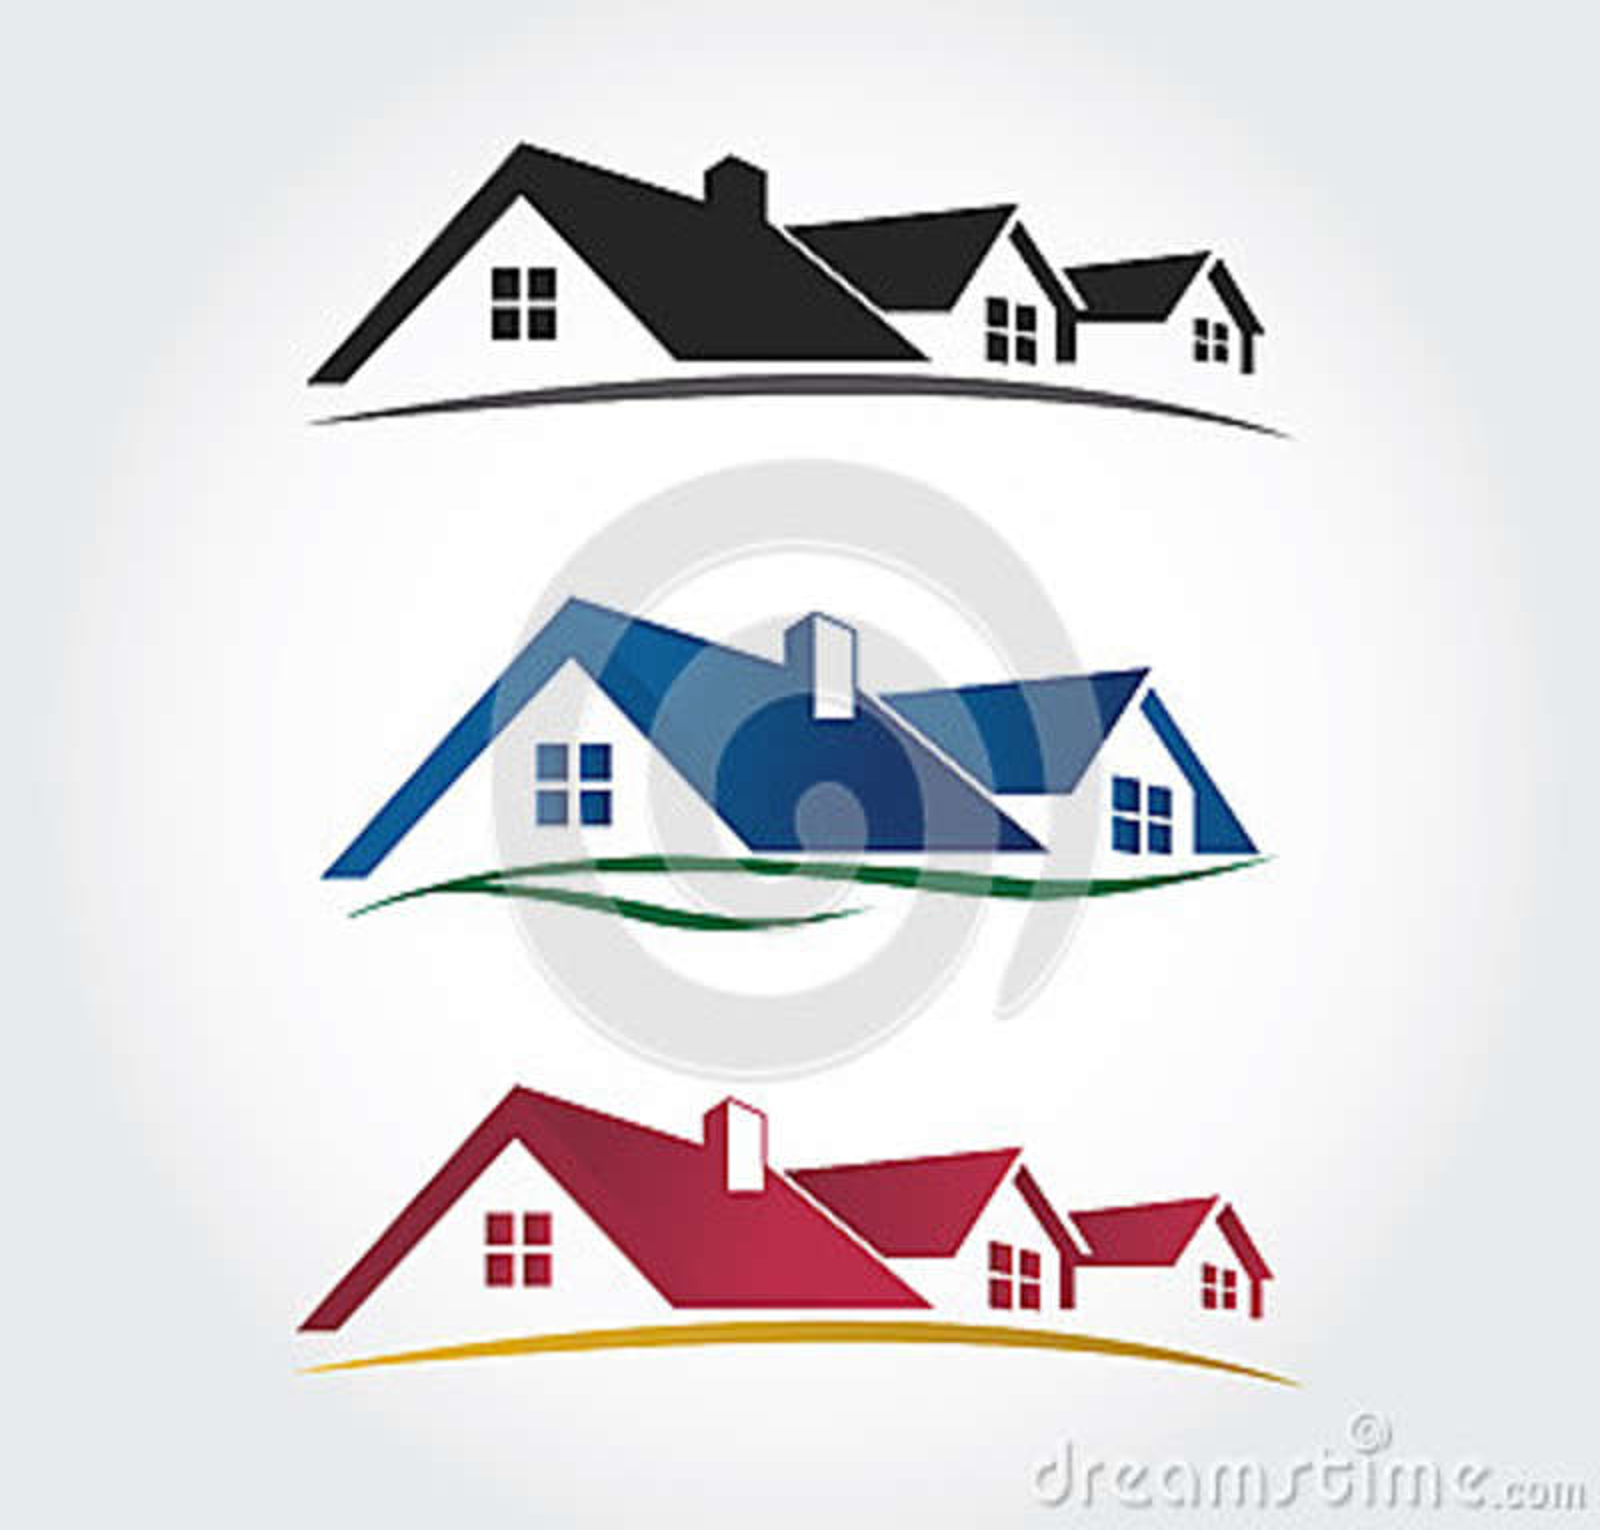 Home Design Icons Set , Roof Vector Set Illustration 39636792 - Megapixl